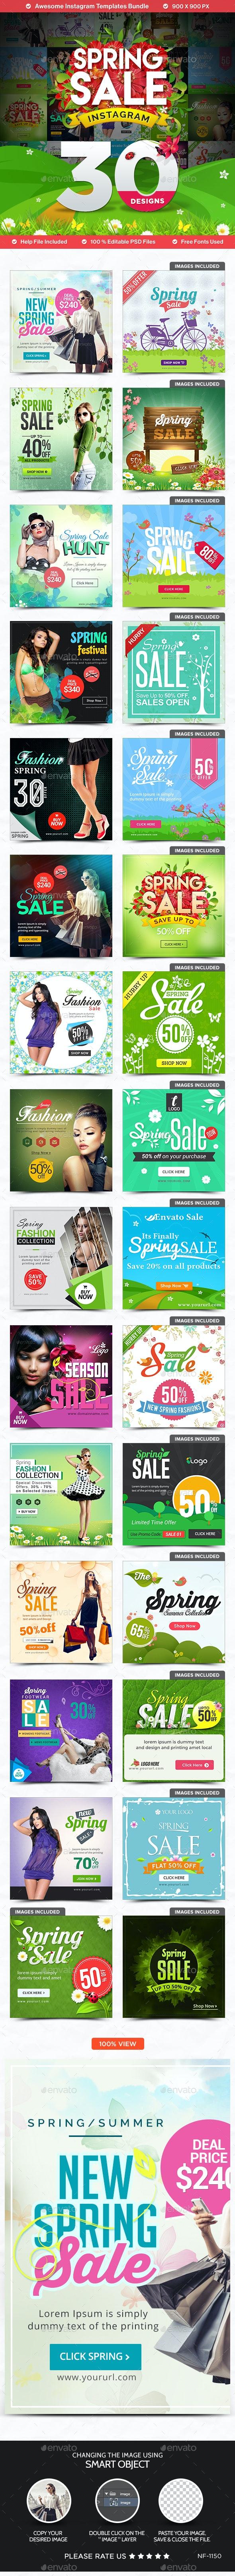 Spring Sale Instagram Templates - 30 Designs - Banners & Ads Web Elements